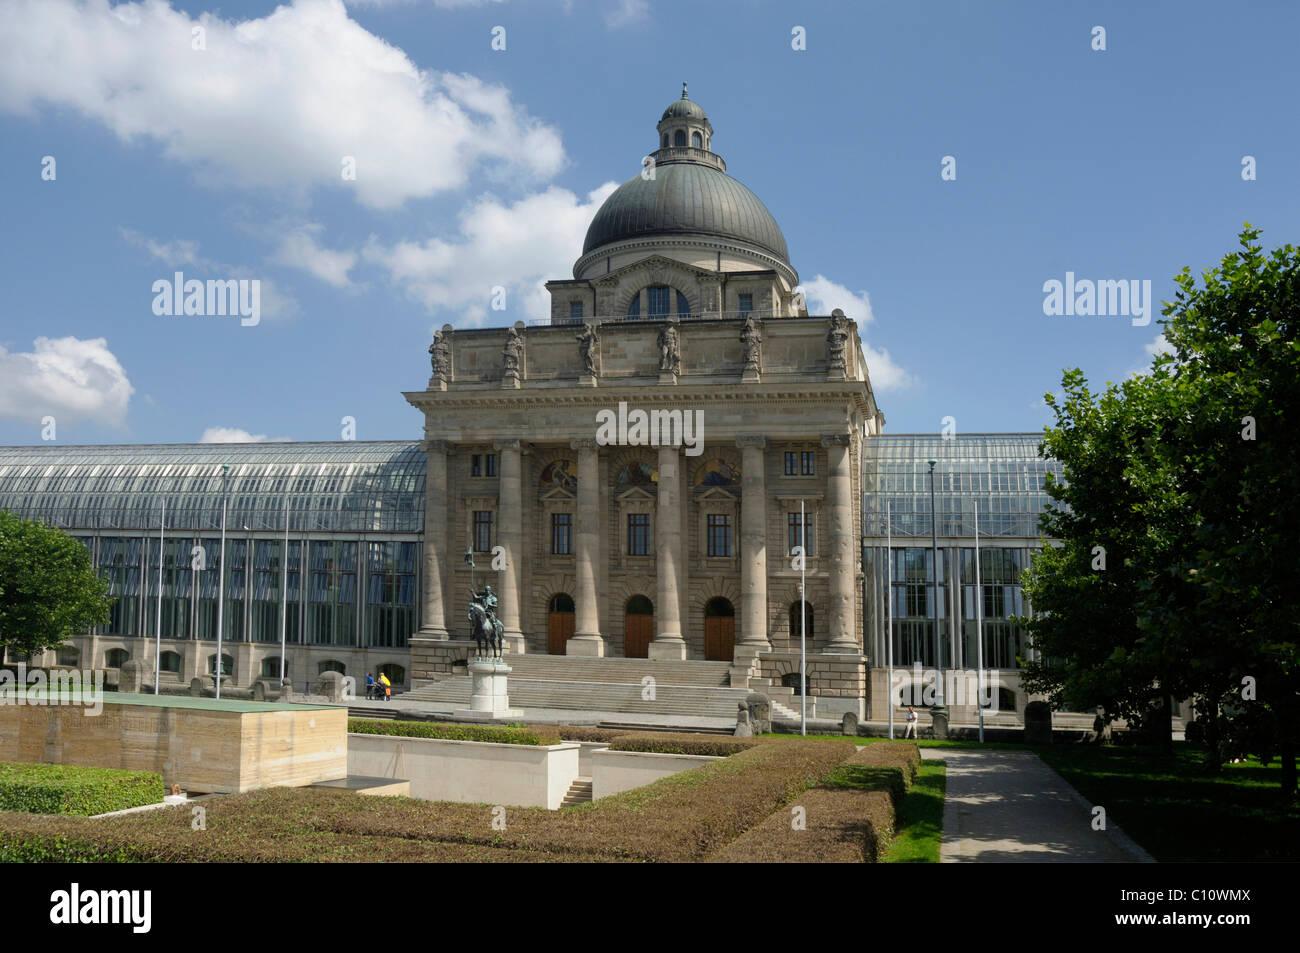 Bavarian State Chancellery, Bayerische Staatskanzlei, Munich, Bavaria, Germany, Europe - Stock Image